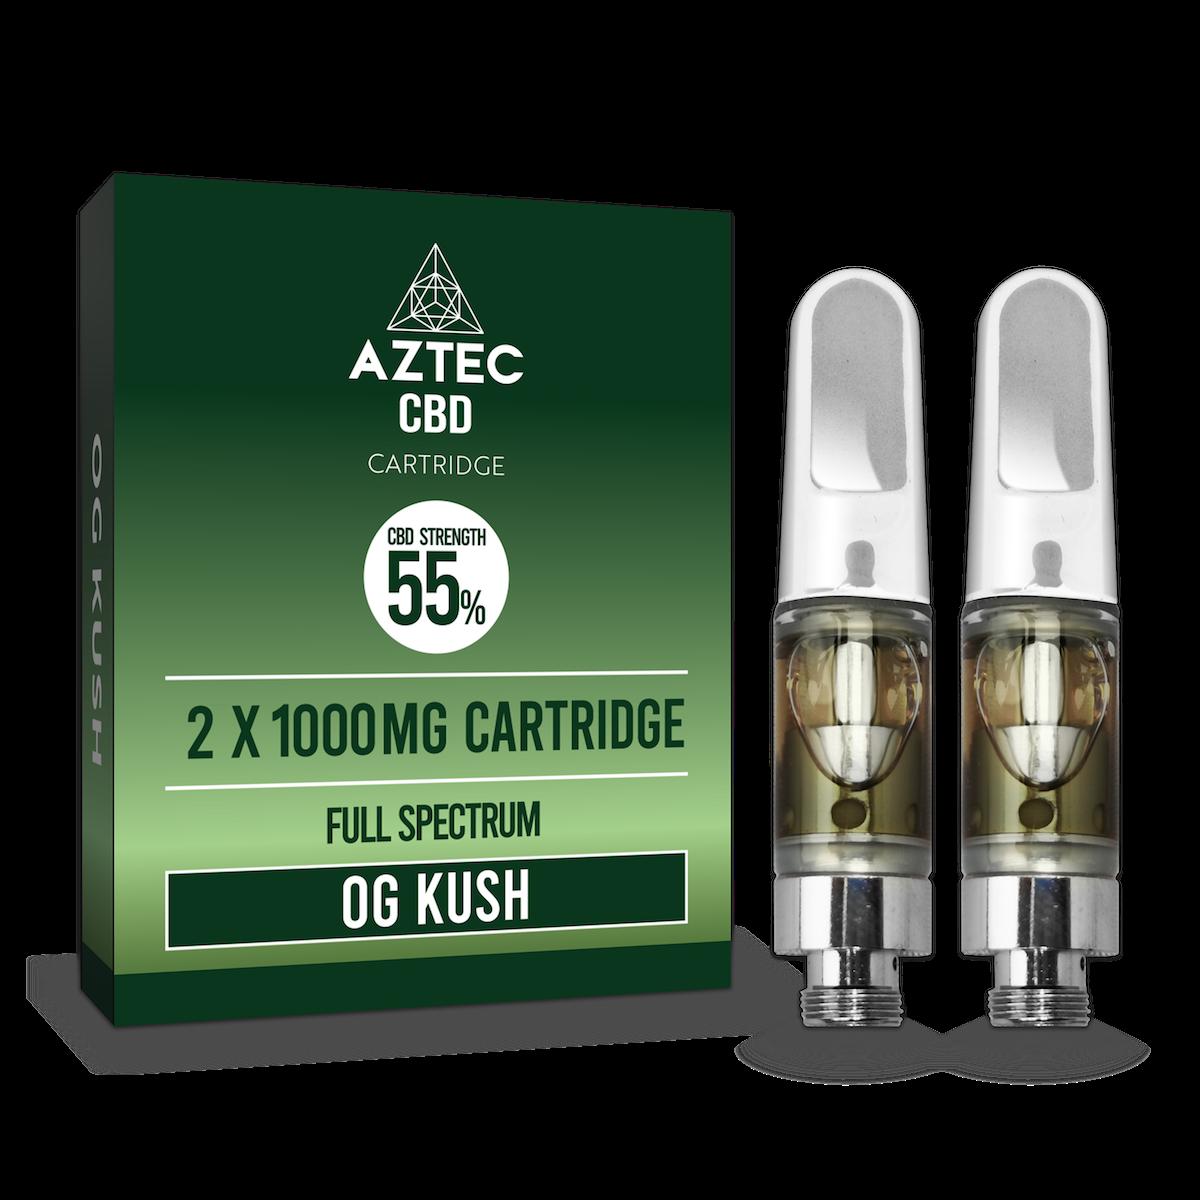 Aztec Refill O.G Kush 2-Pack 55% CBD Cartridges